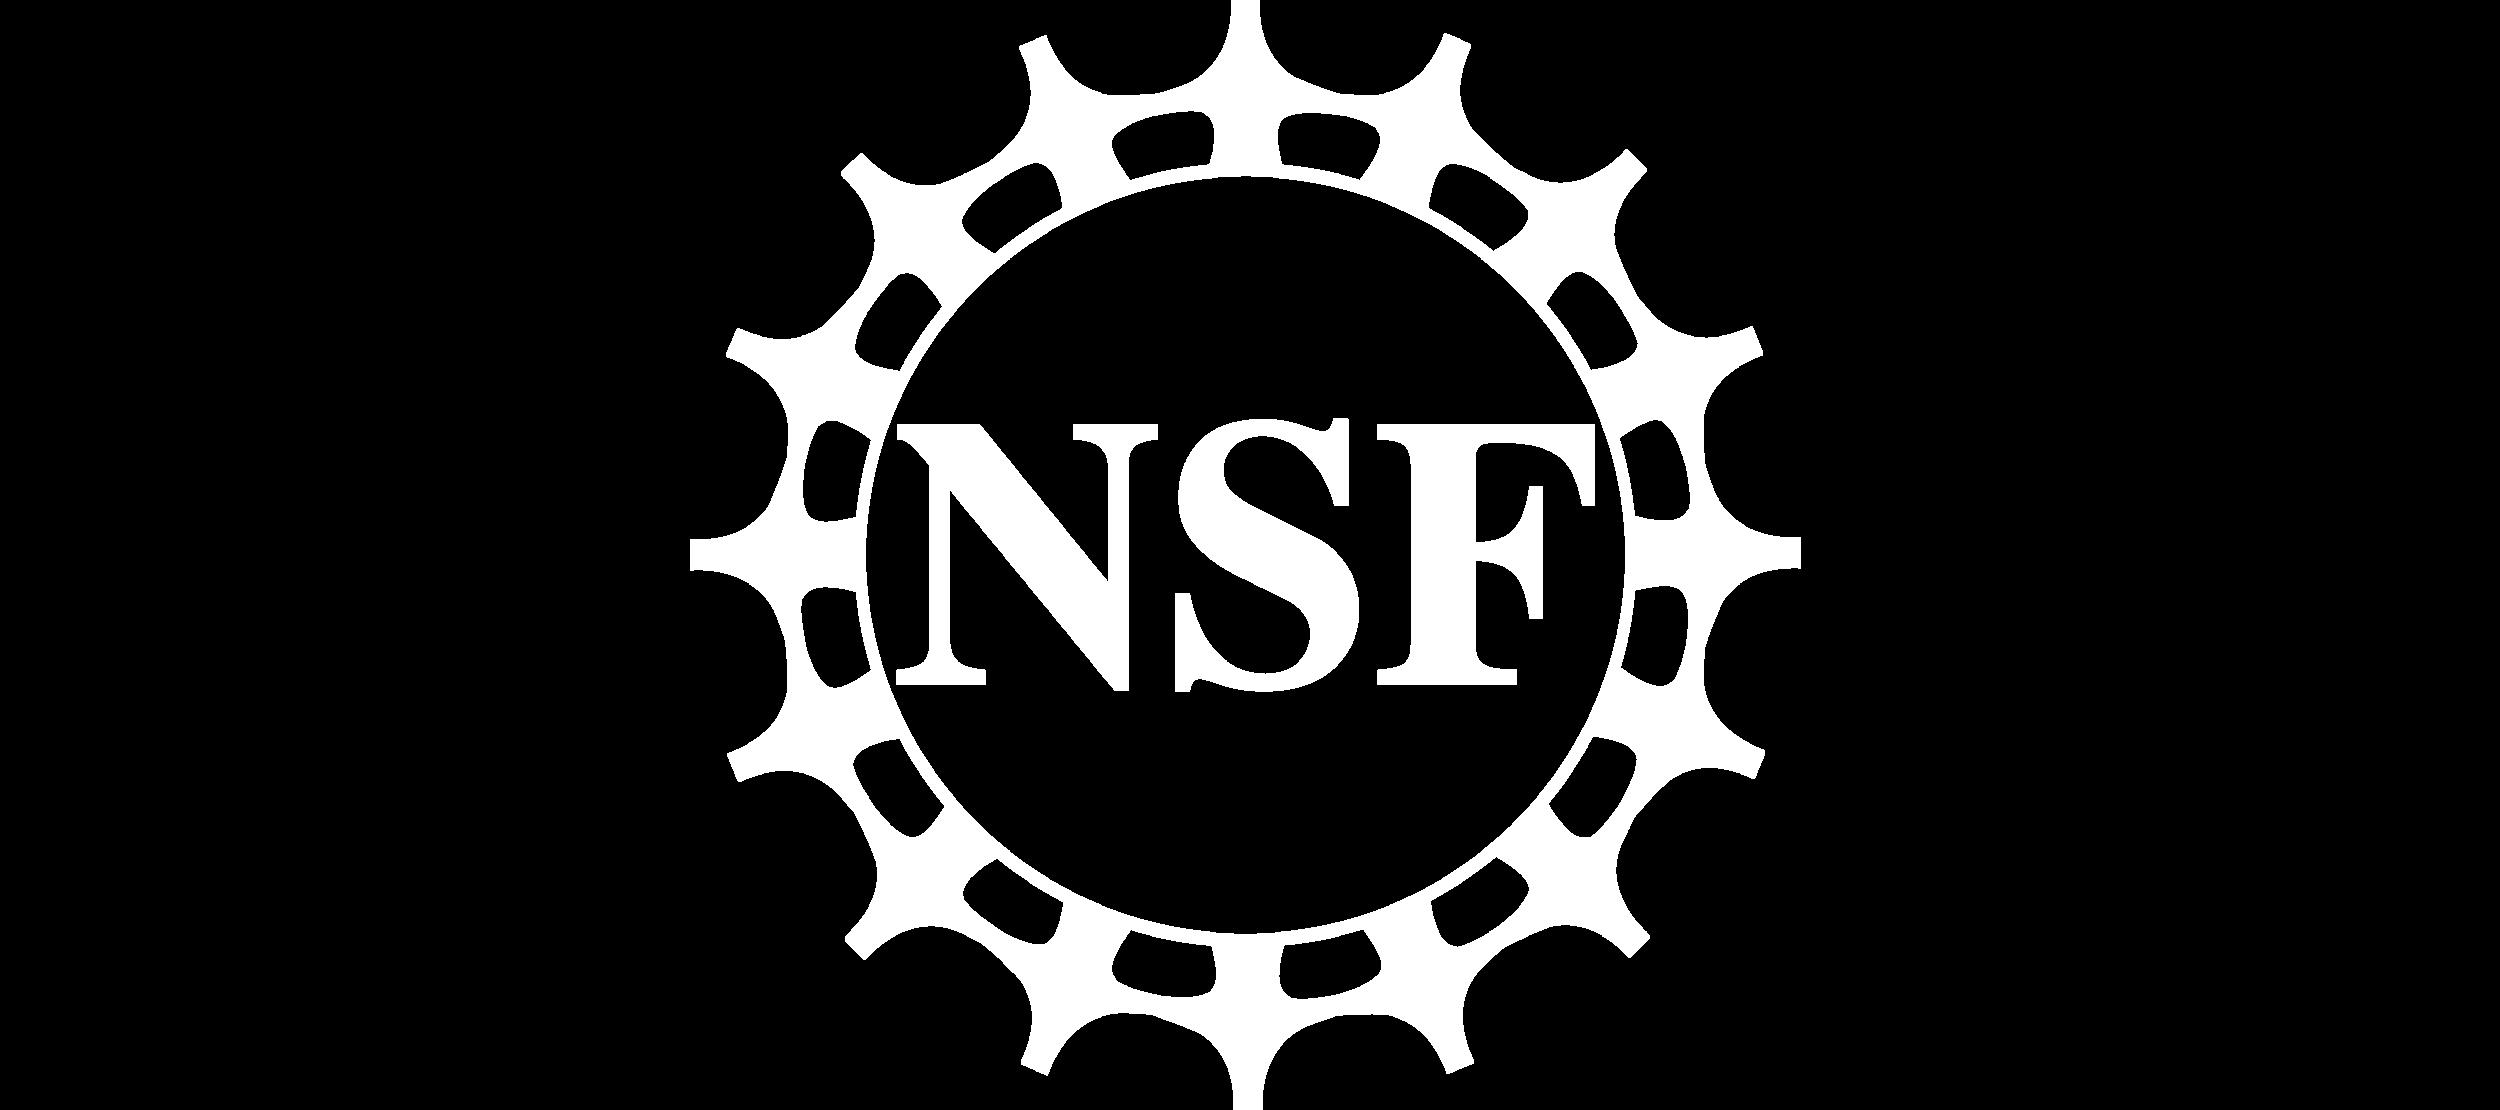 nsf2 horizontal.png